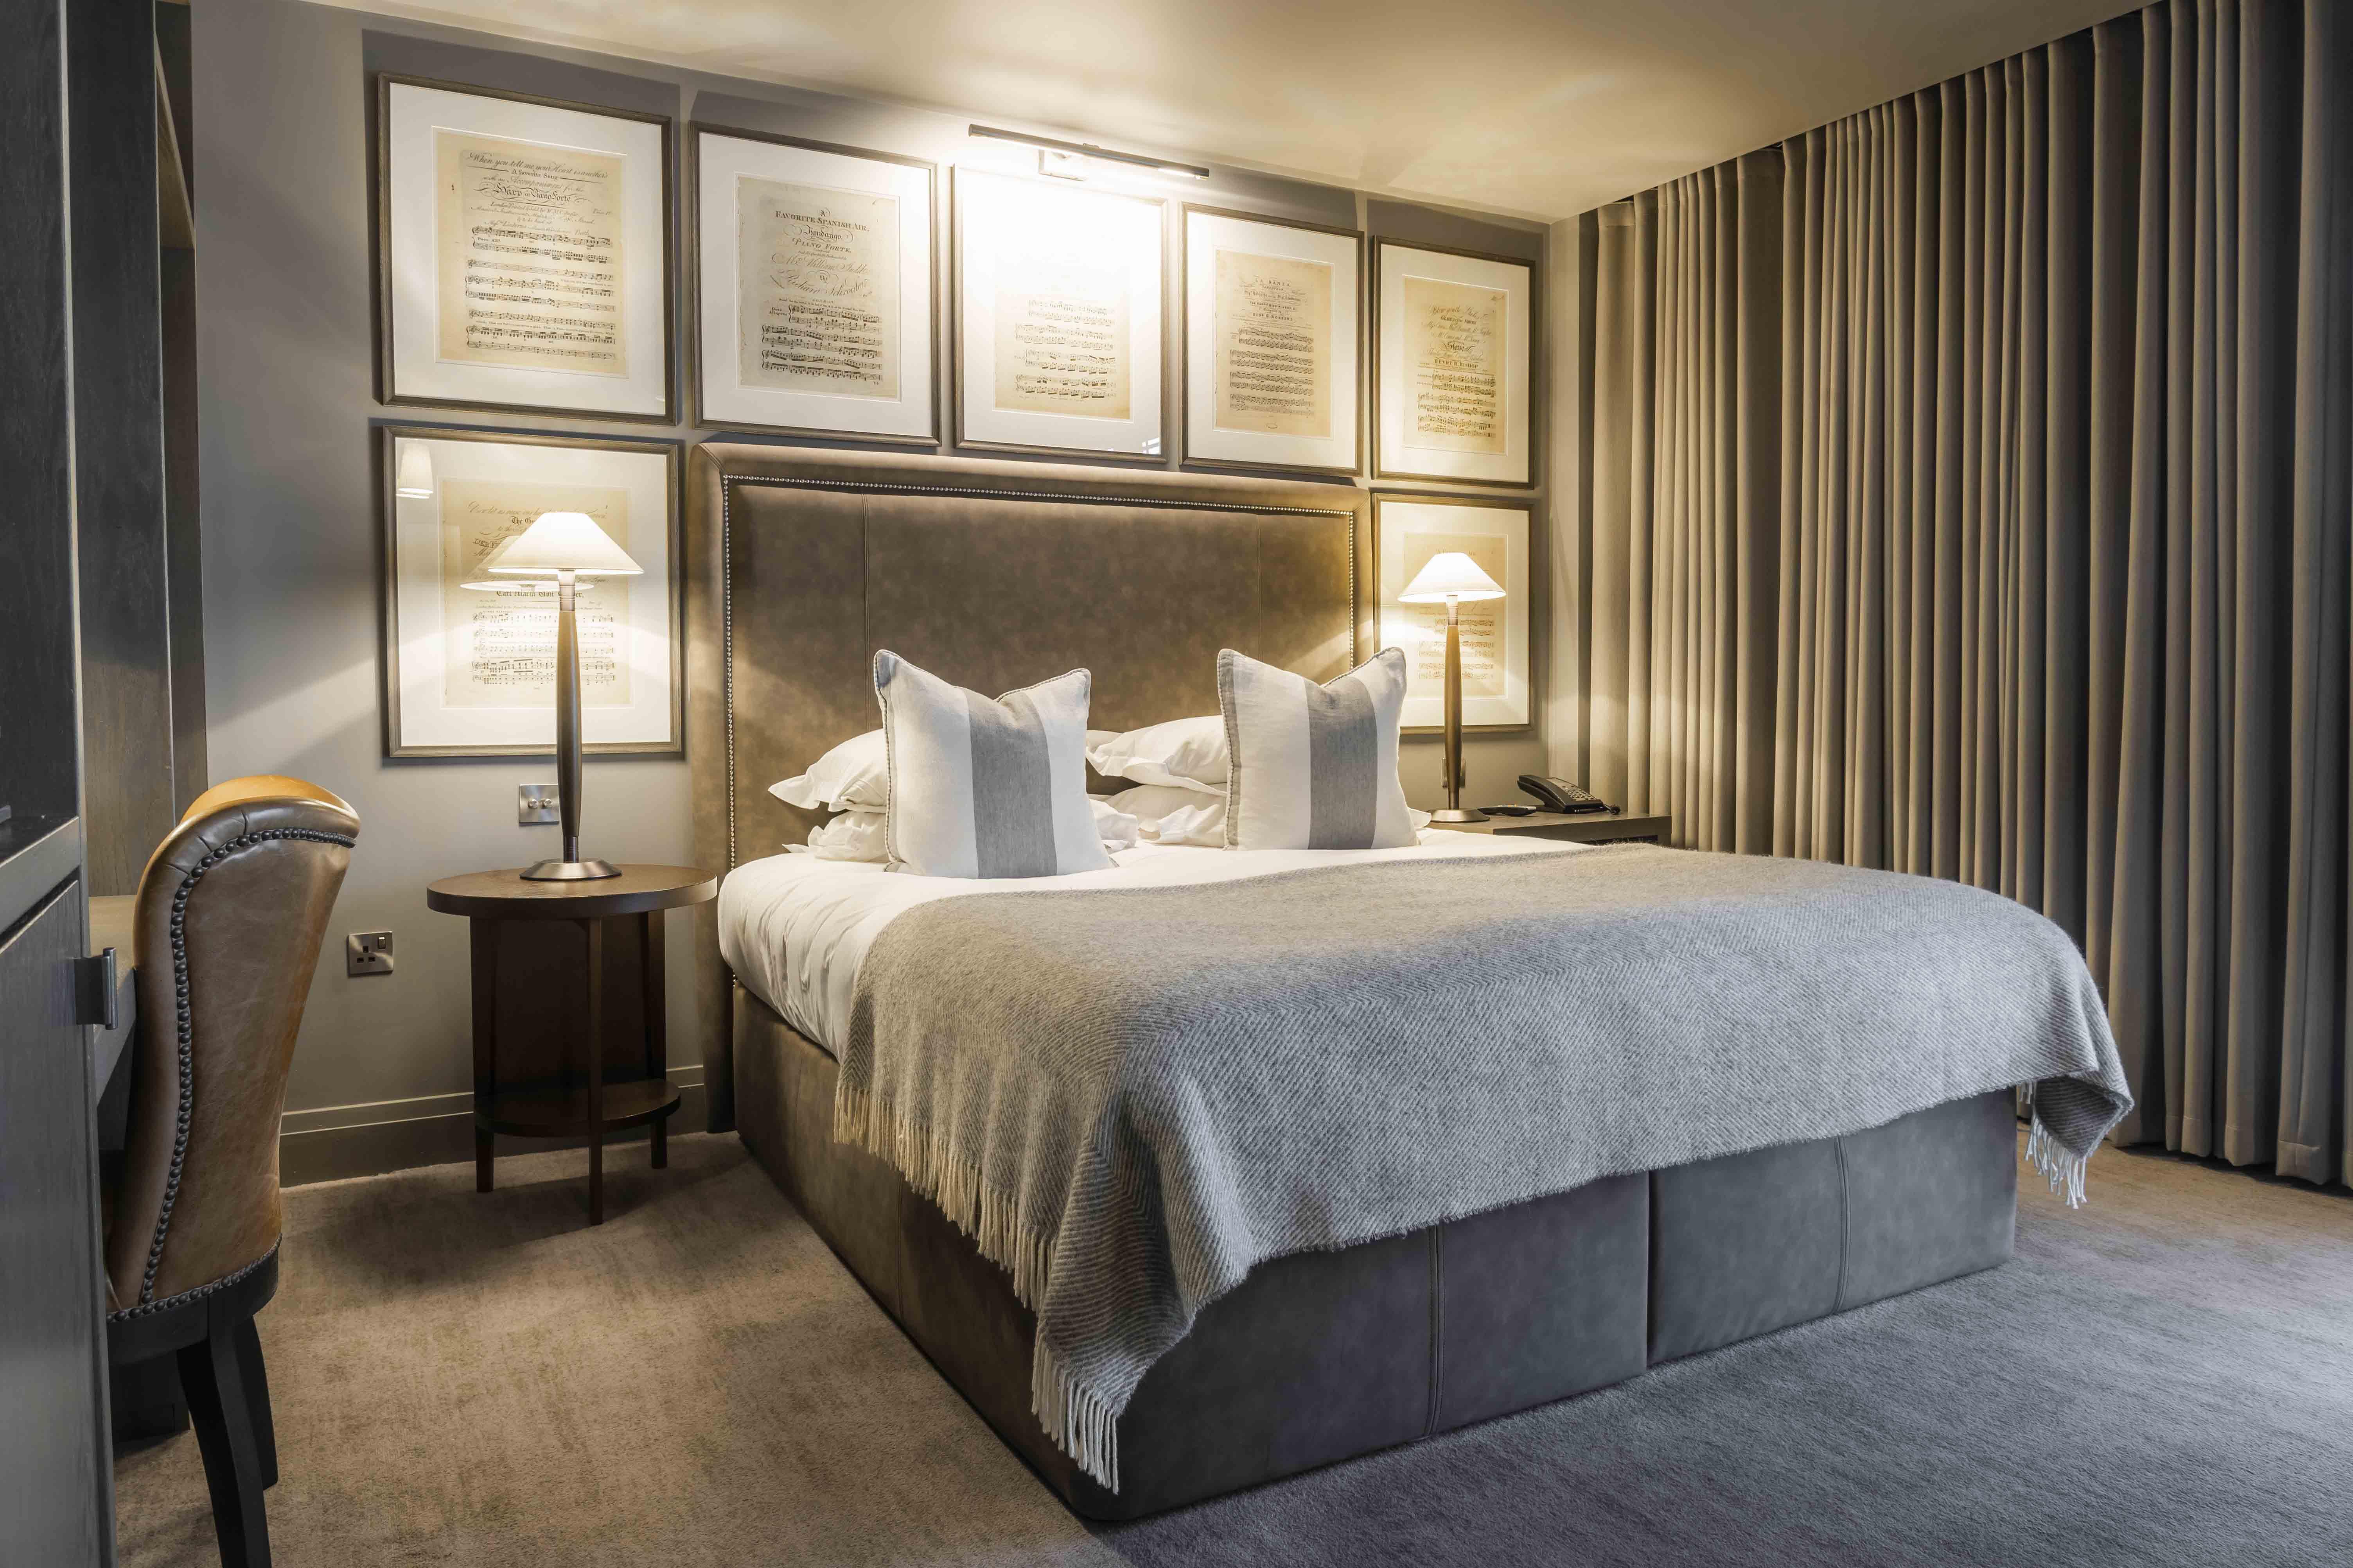 Dakota Hotel Glasgow classic bedroom, sumptuous double bed